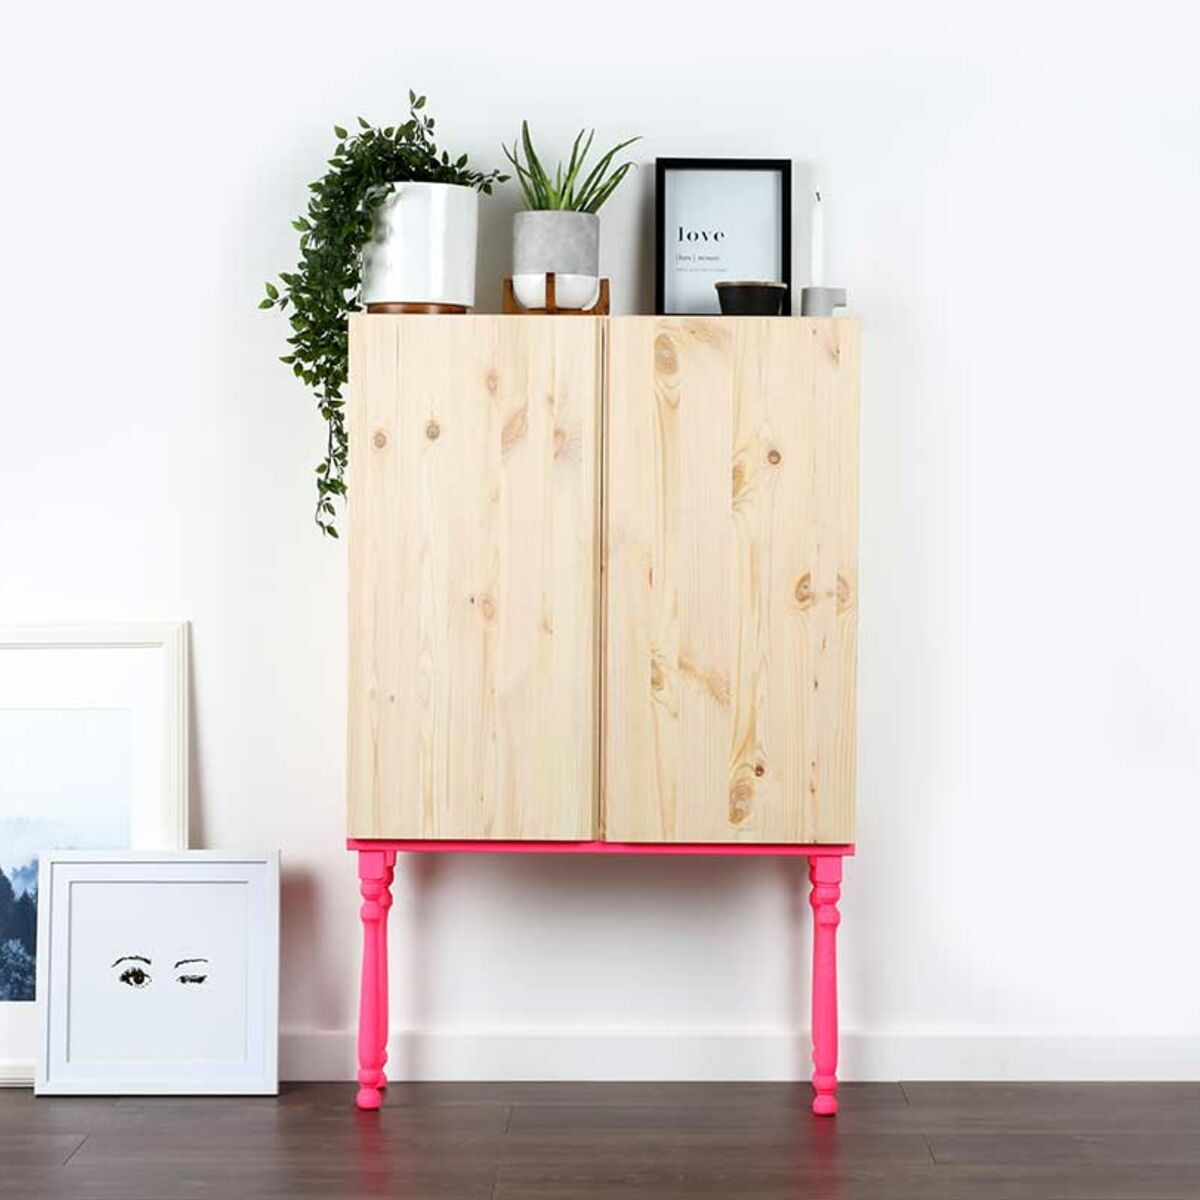 Transformer Ses Meubles Ikea diy : customiser une armoire ikea : femme actuelle le mag